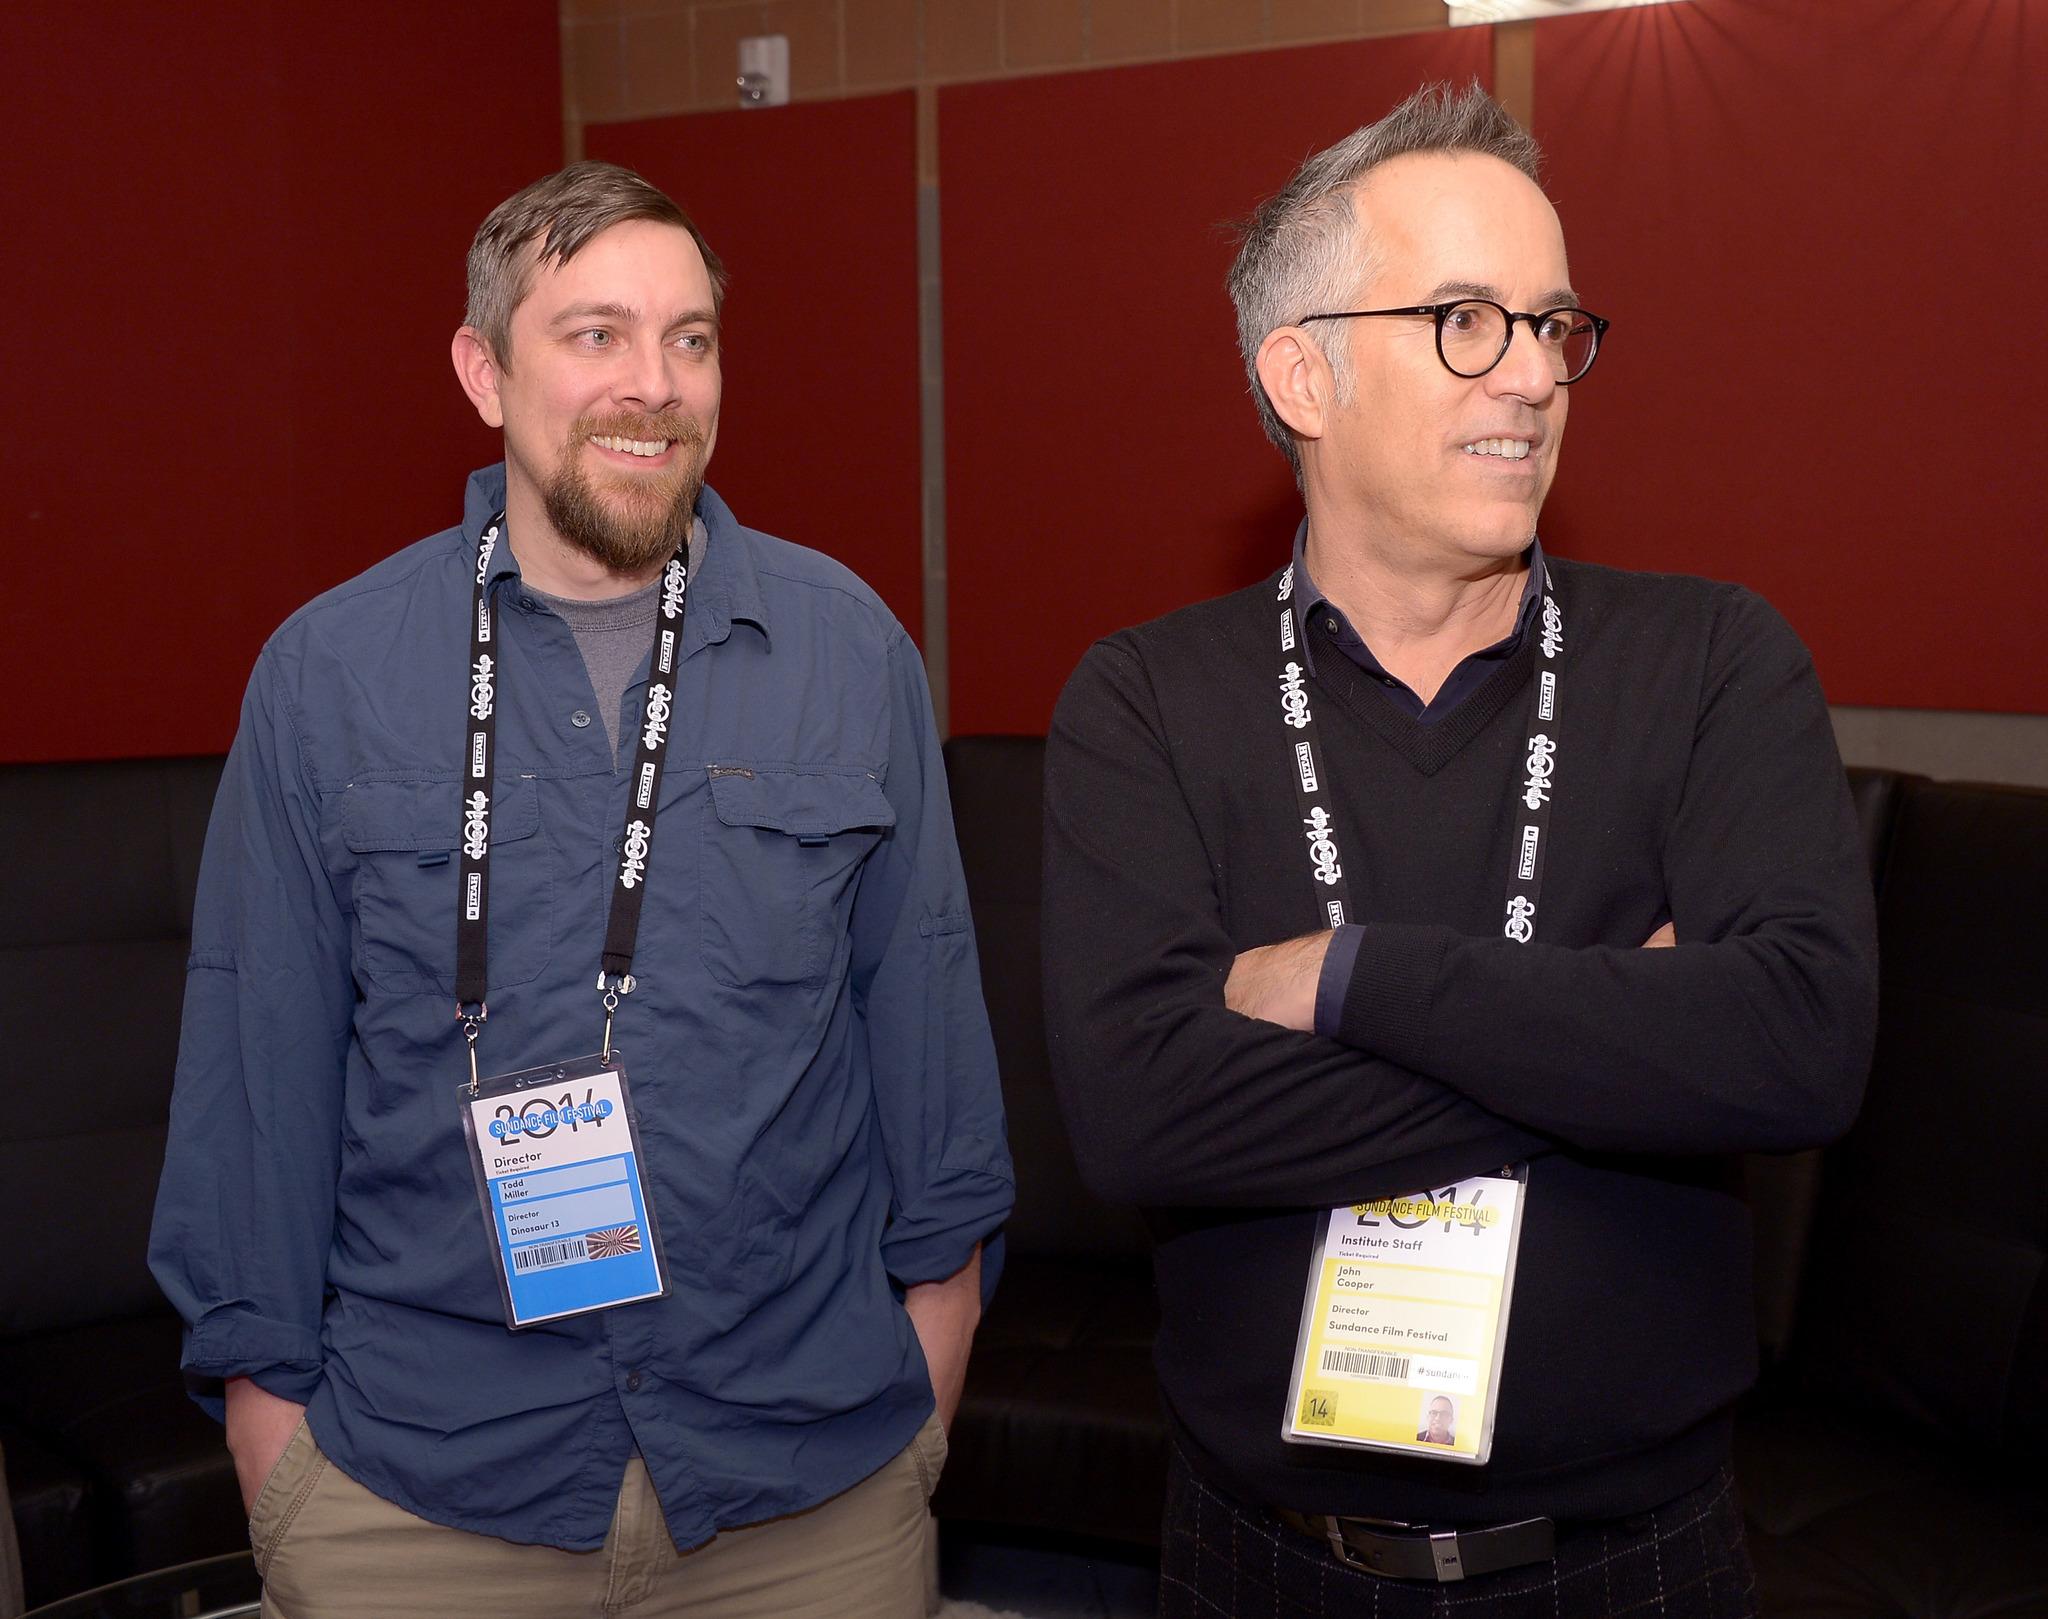 Todd Douglas Miller and John Cooper at event of Dinosaur 13 (2014)